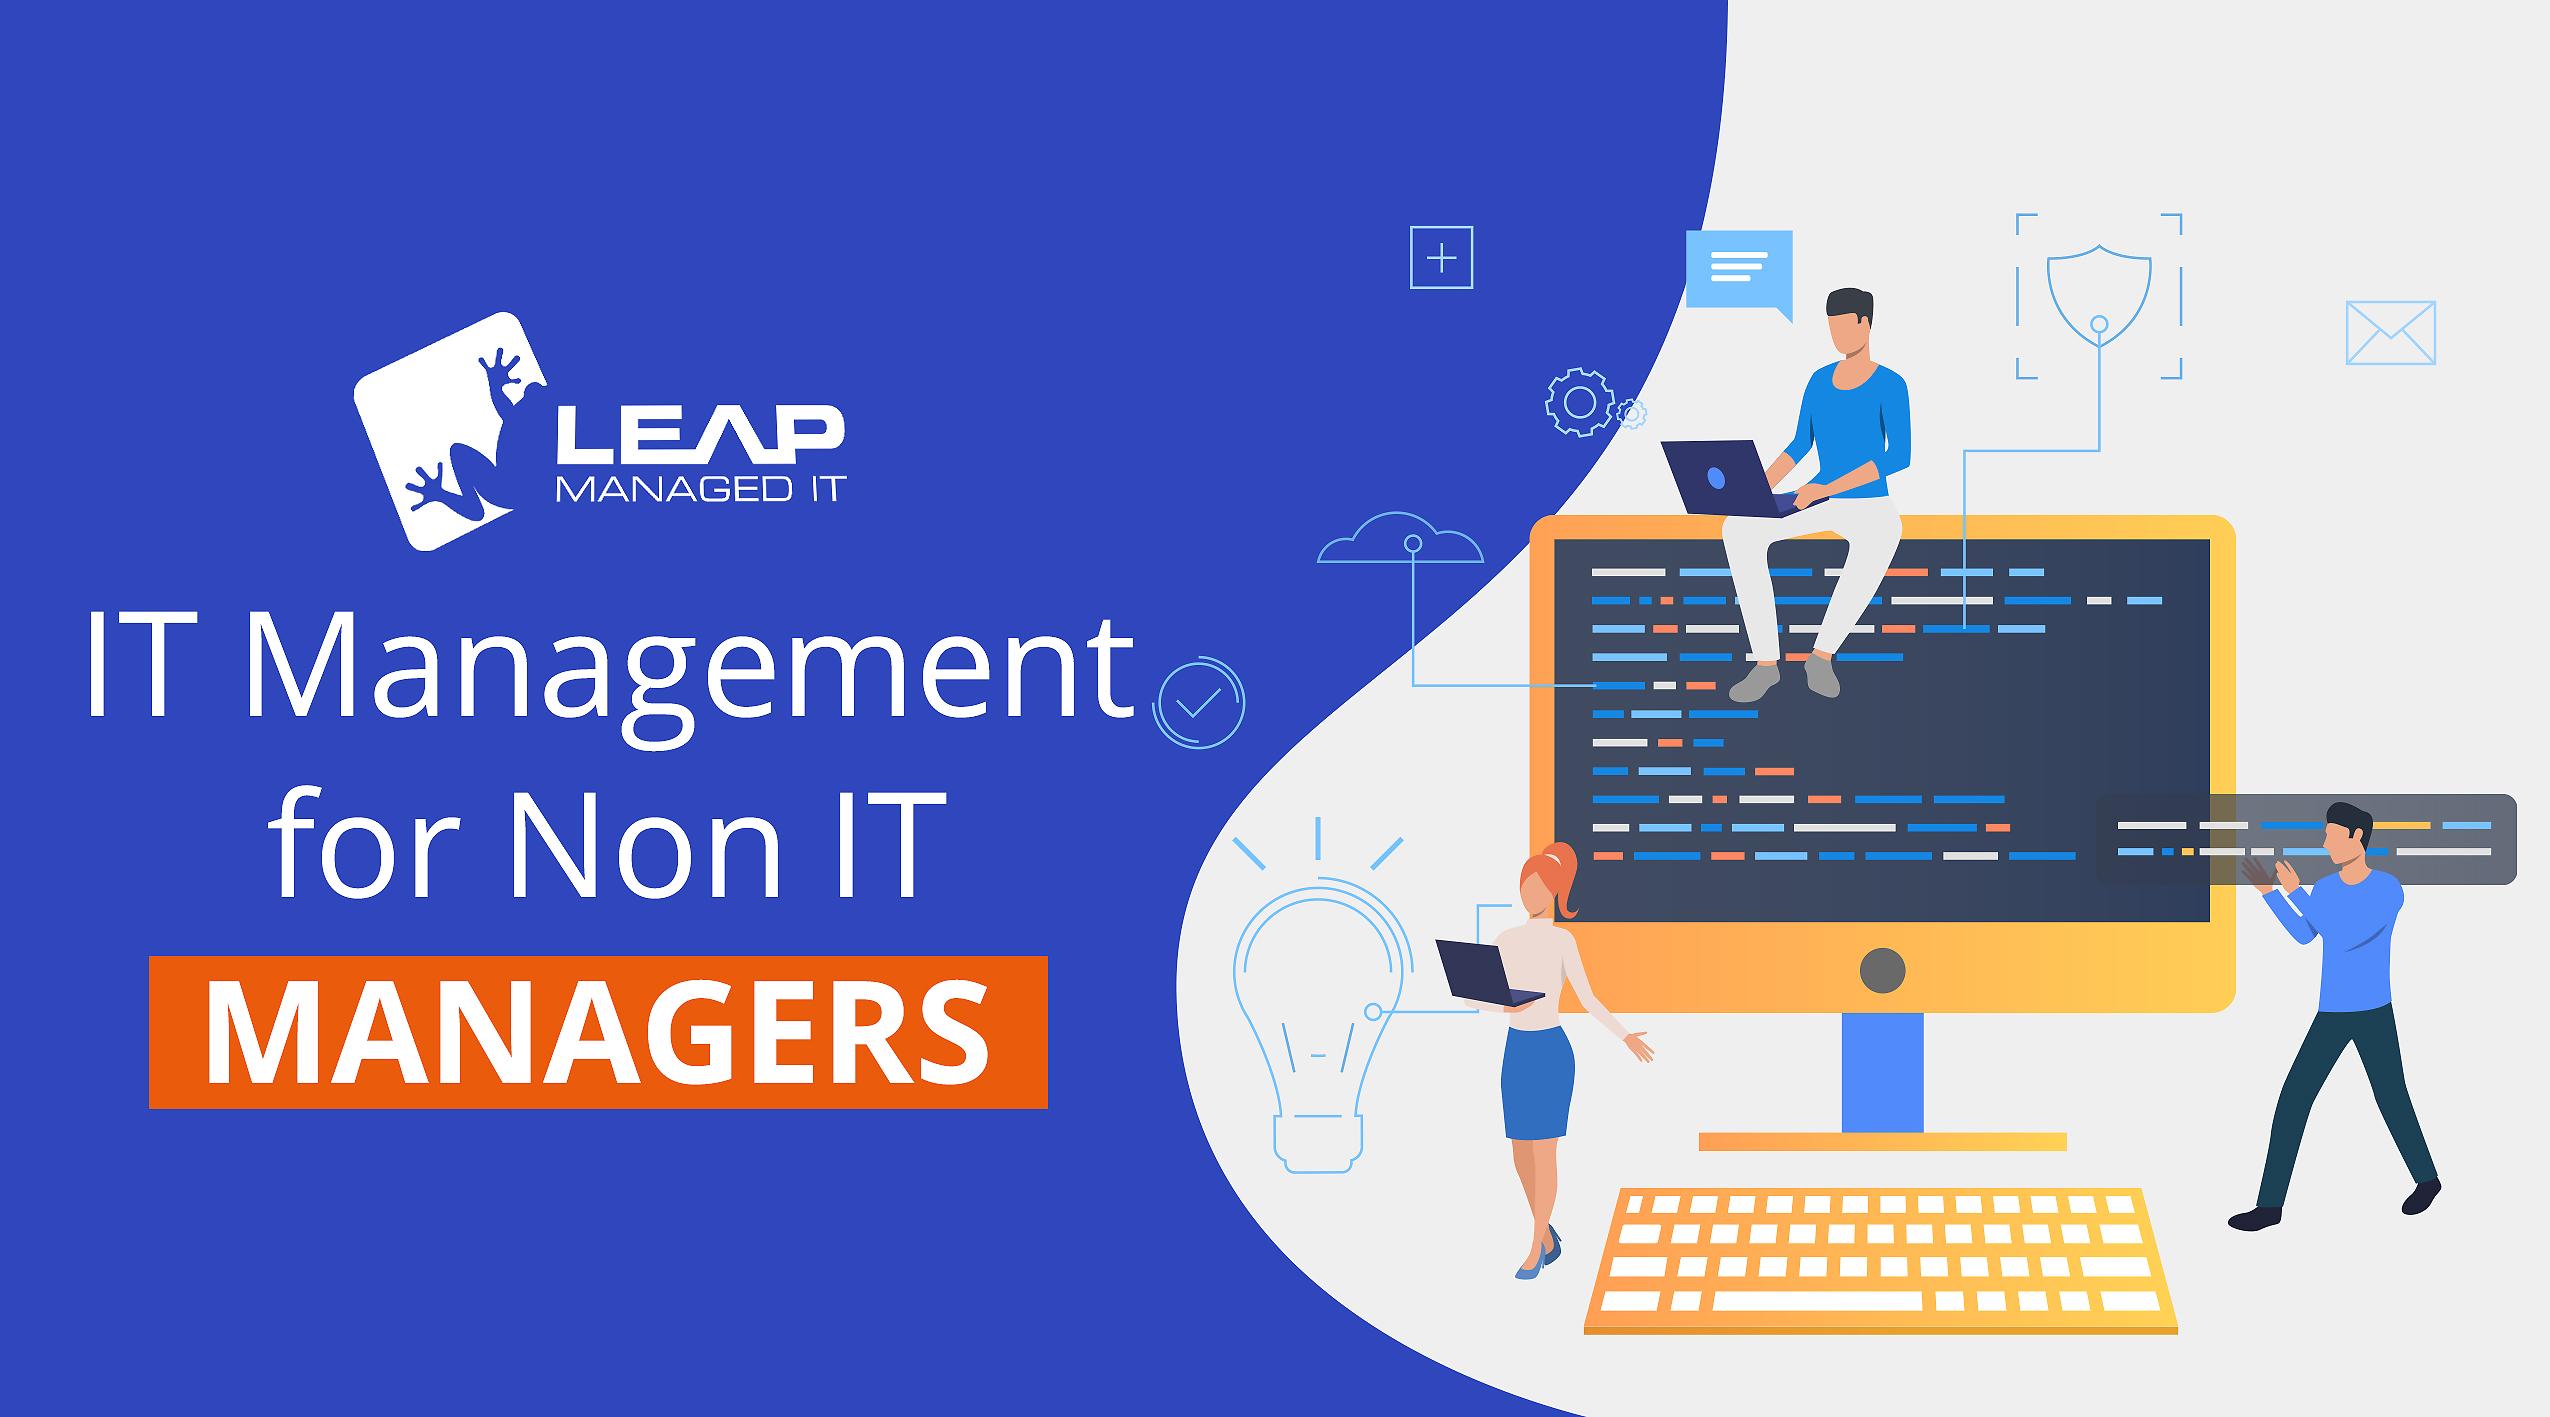 I.T. Management